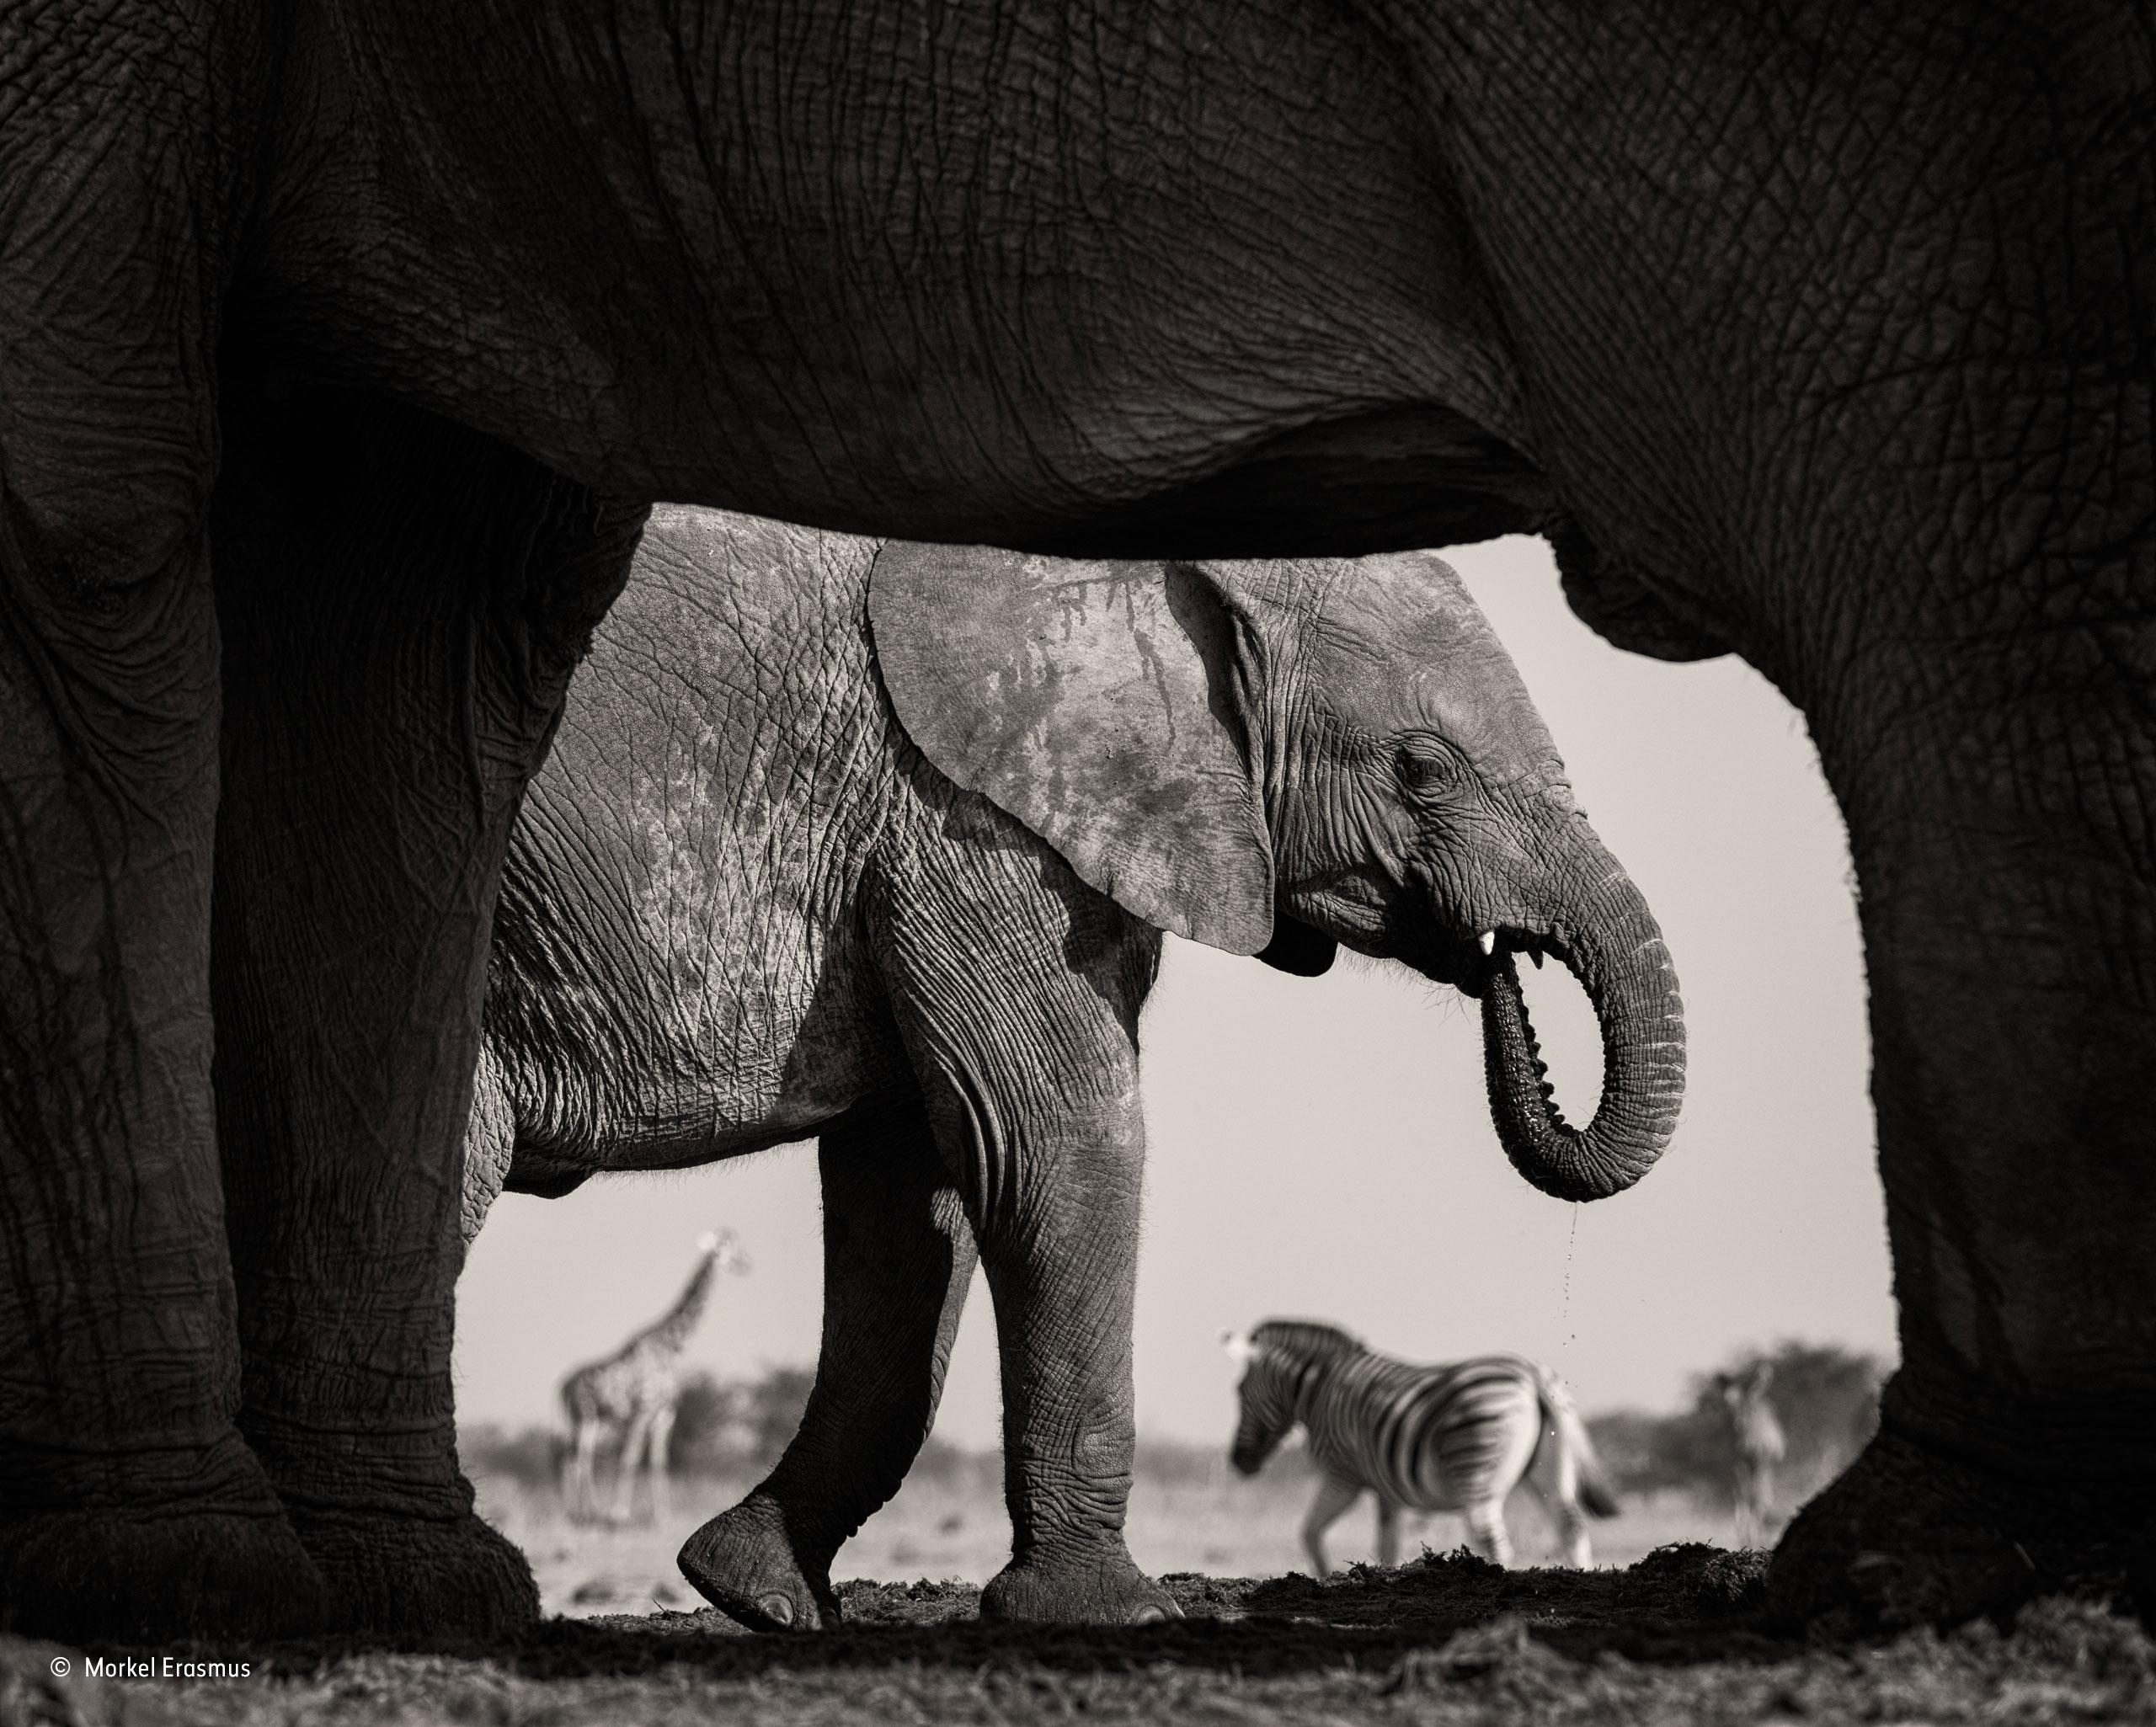 Natural frame | Morkel Erasmus | Black and White | Wildlife ...